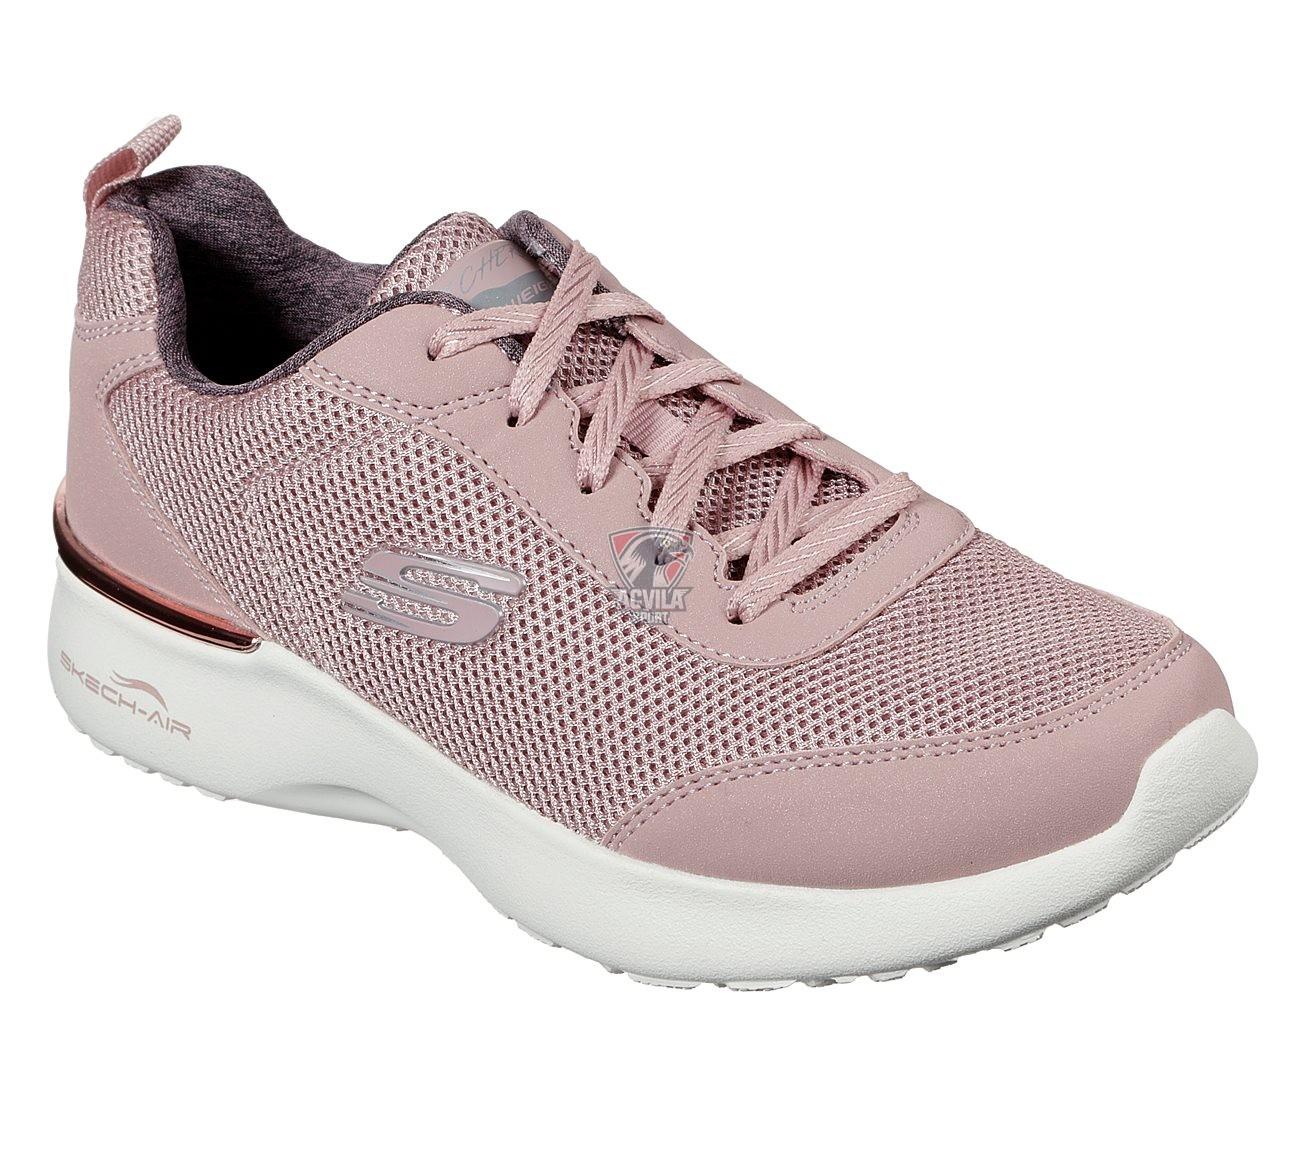 Photo acvilasport - Женская обувь SKECHERS GO RUN CONSISTENT